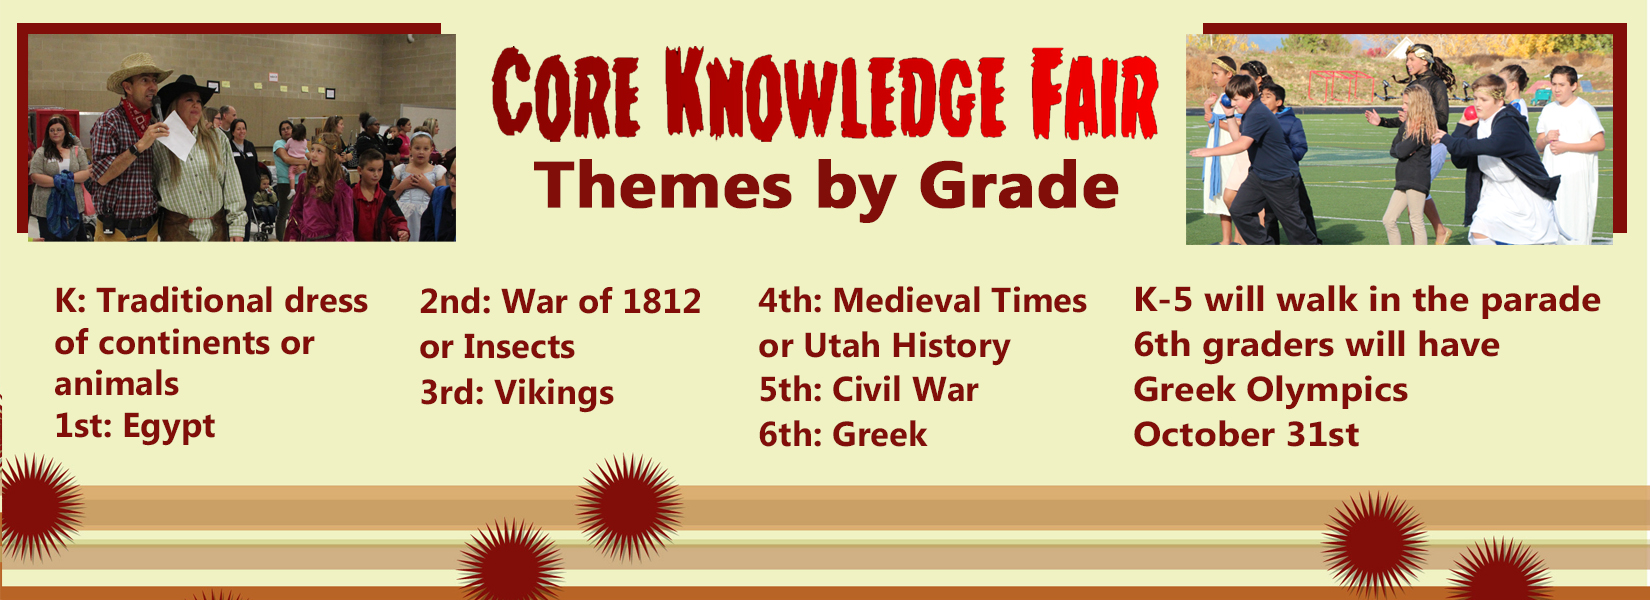 Core-Knowledge-Fair-2017